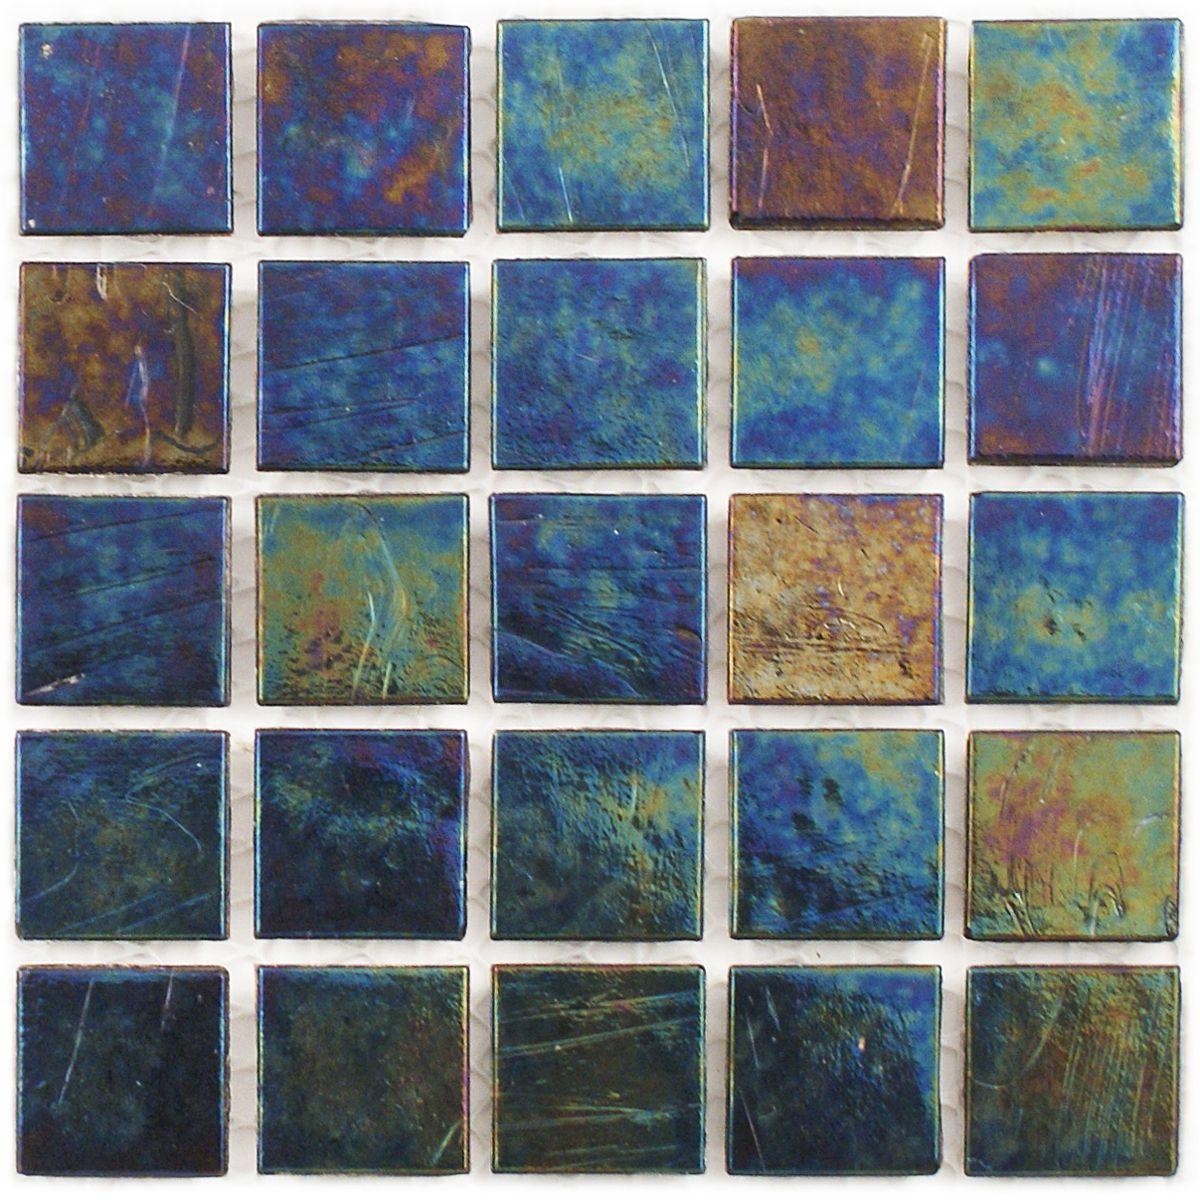 Hakatai Enterprises A20 IR Tivoli Floor Tile, Indigo Blend (Set of ...